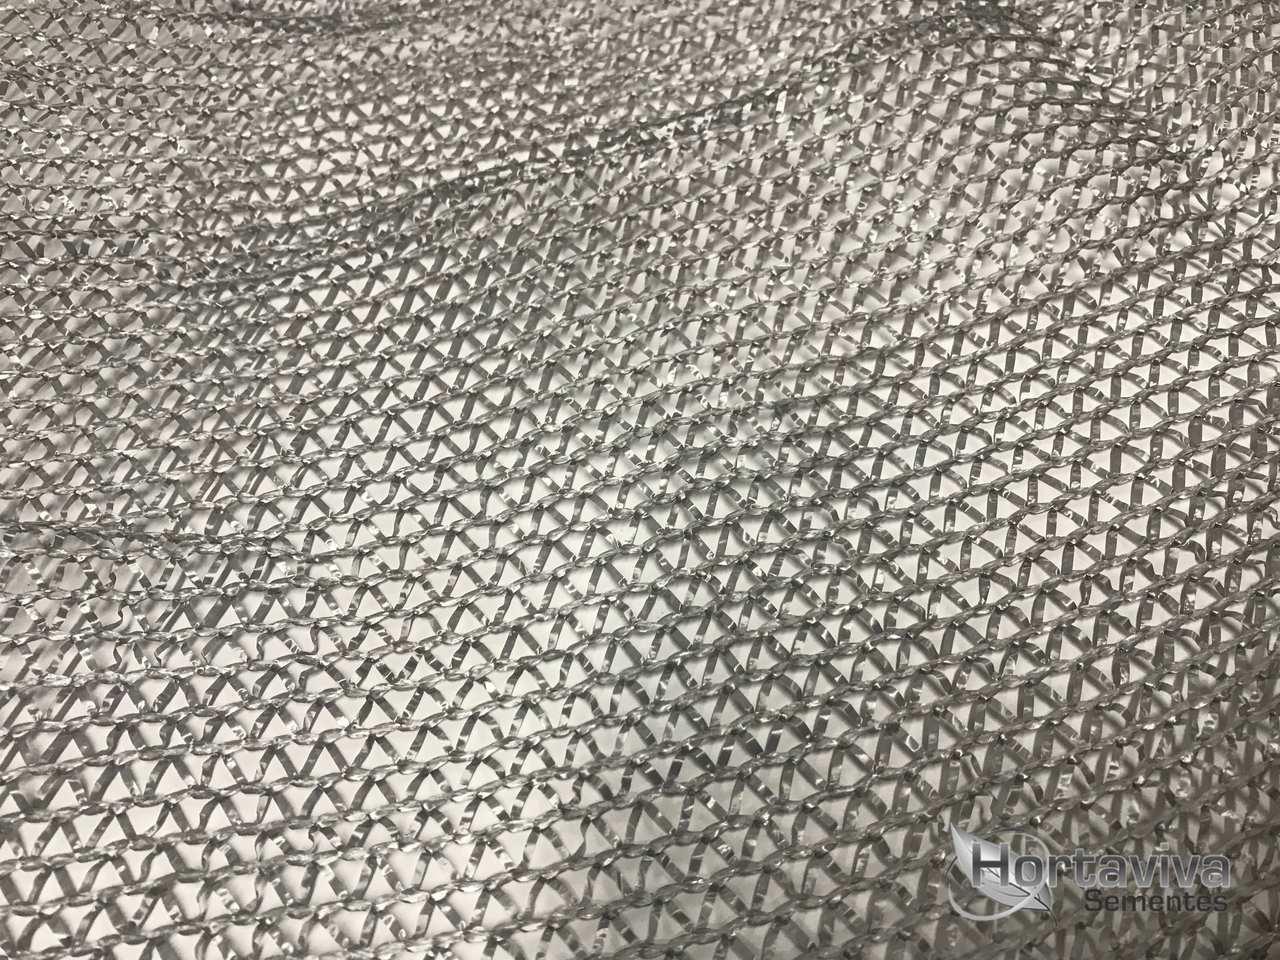 Tela de Sombreamento Prata Termo Refletora Freshnet 35% - Largura: 7 Metros